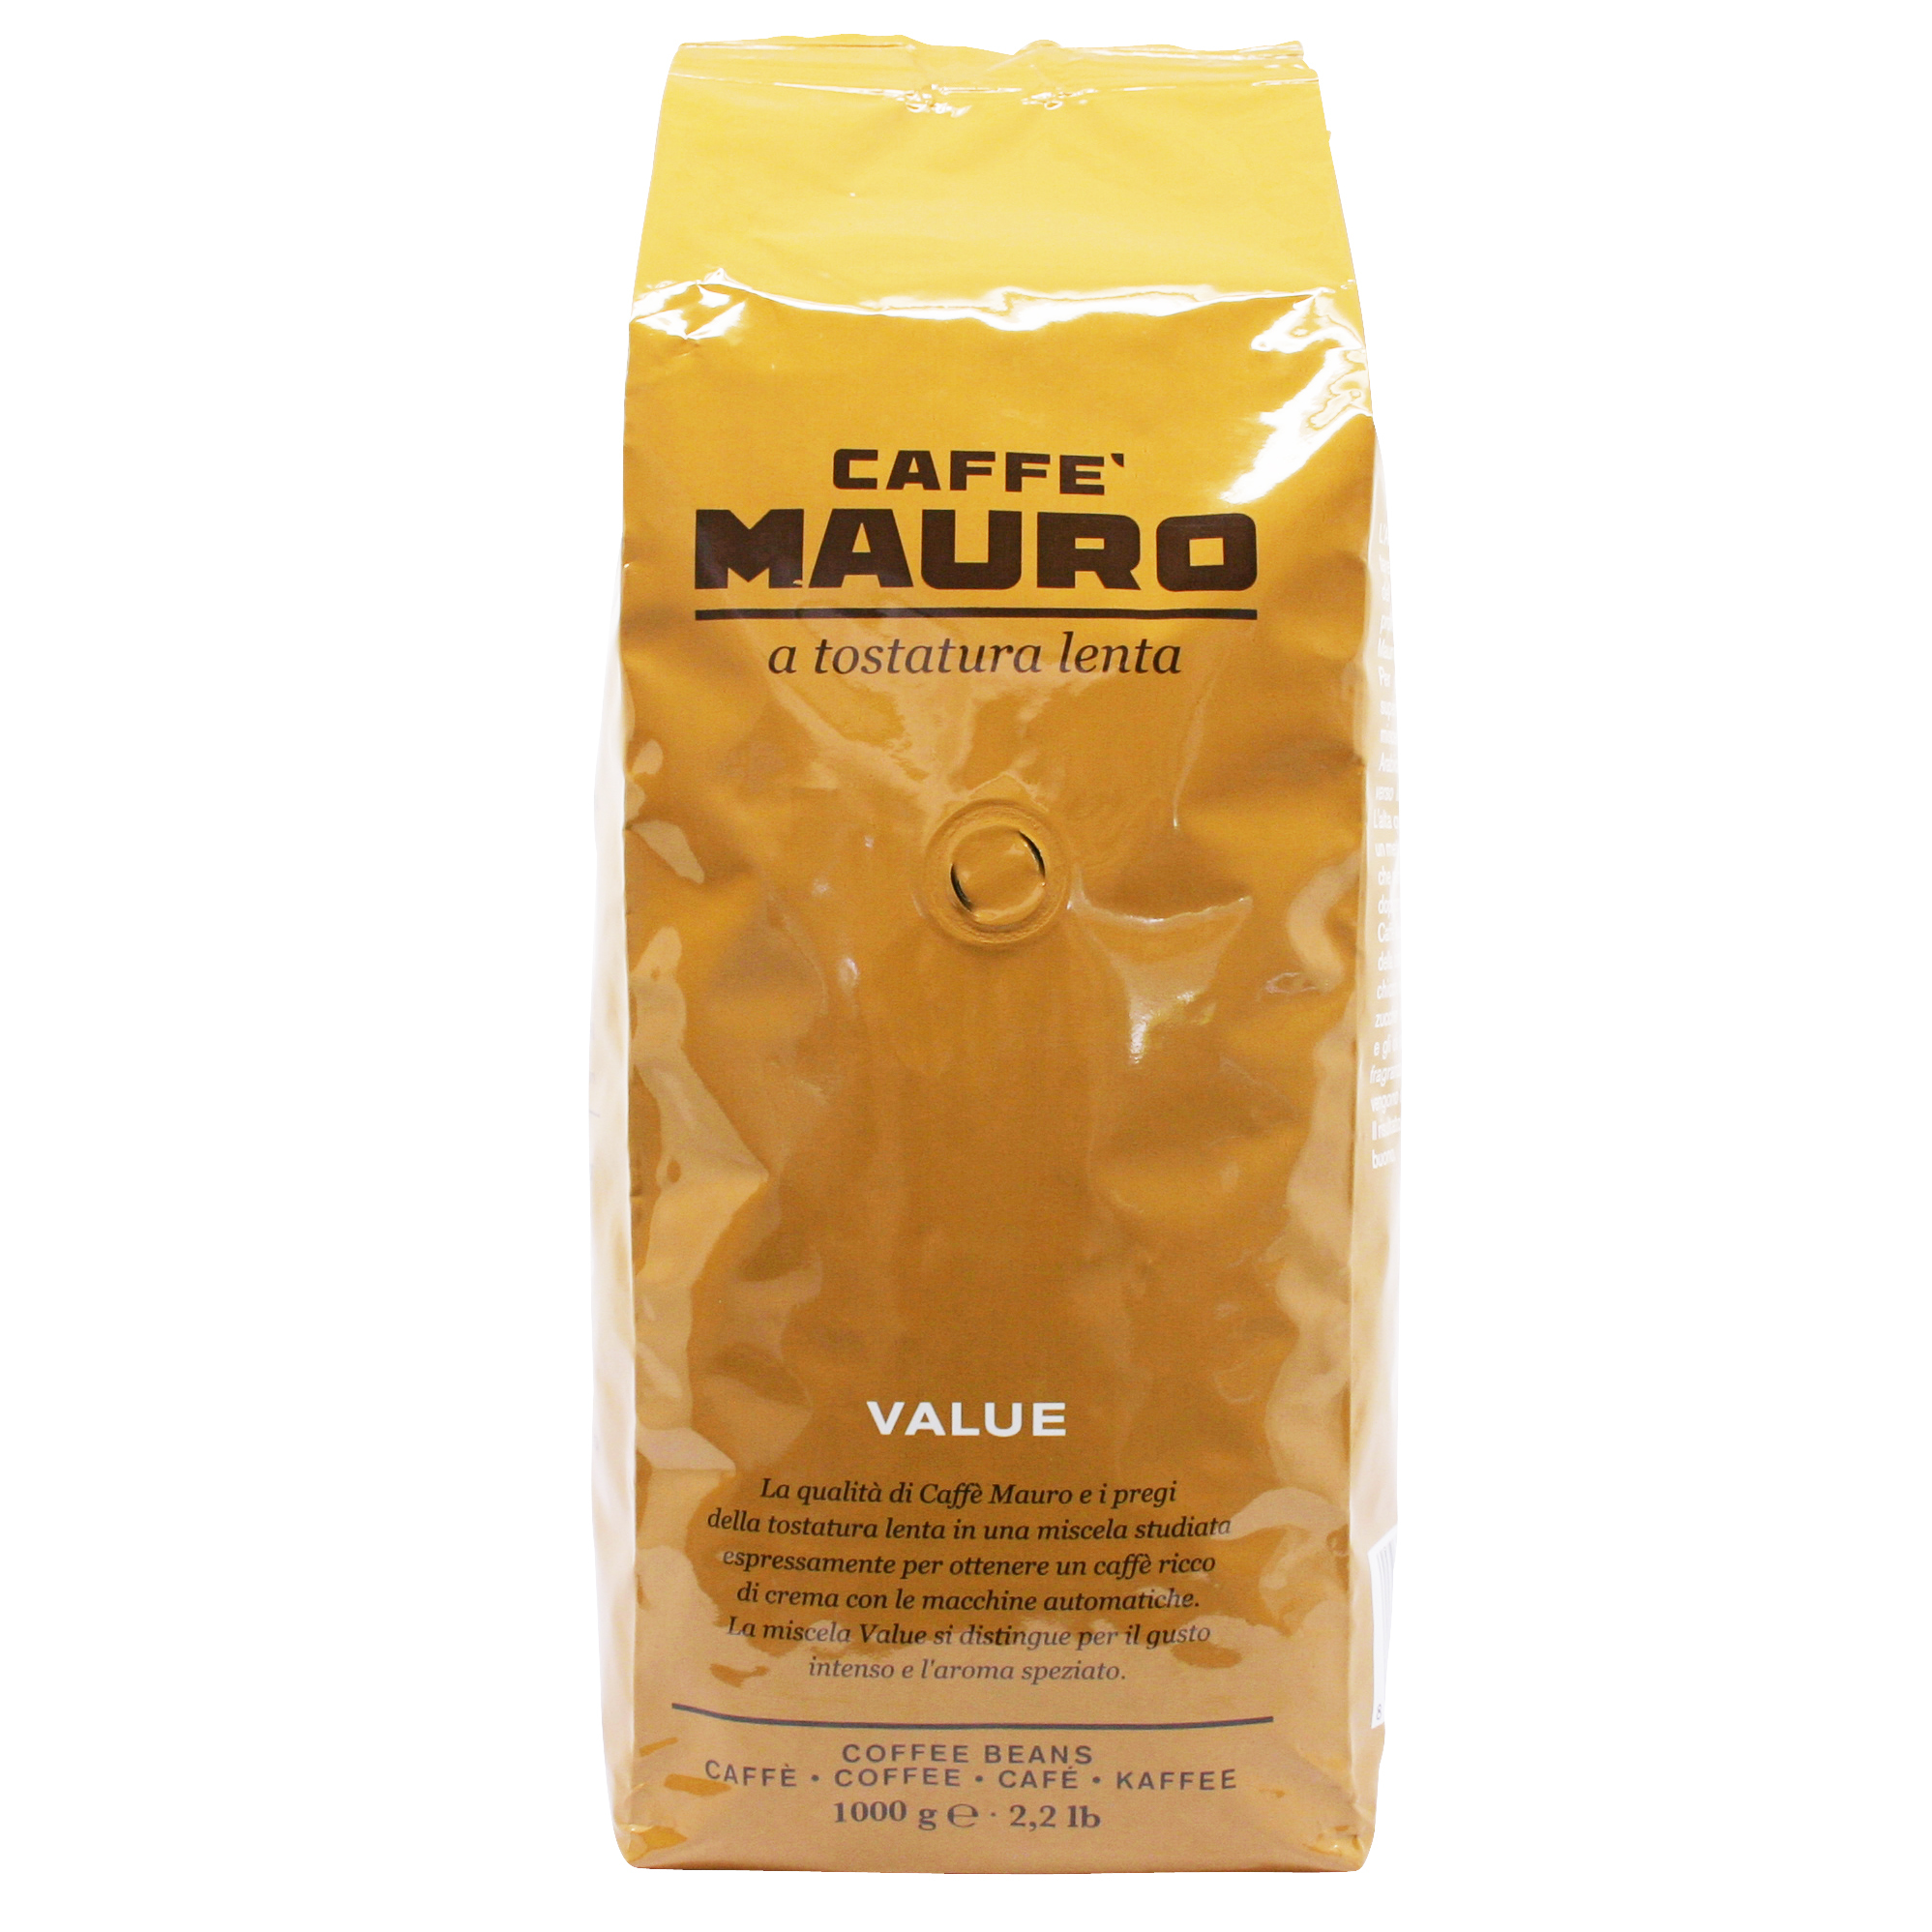 mauro value2